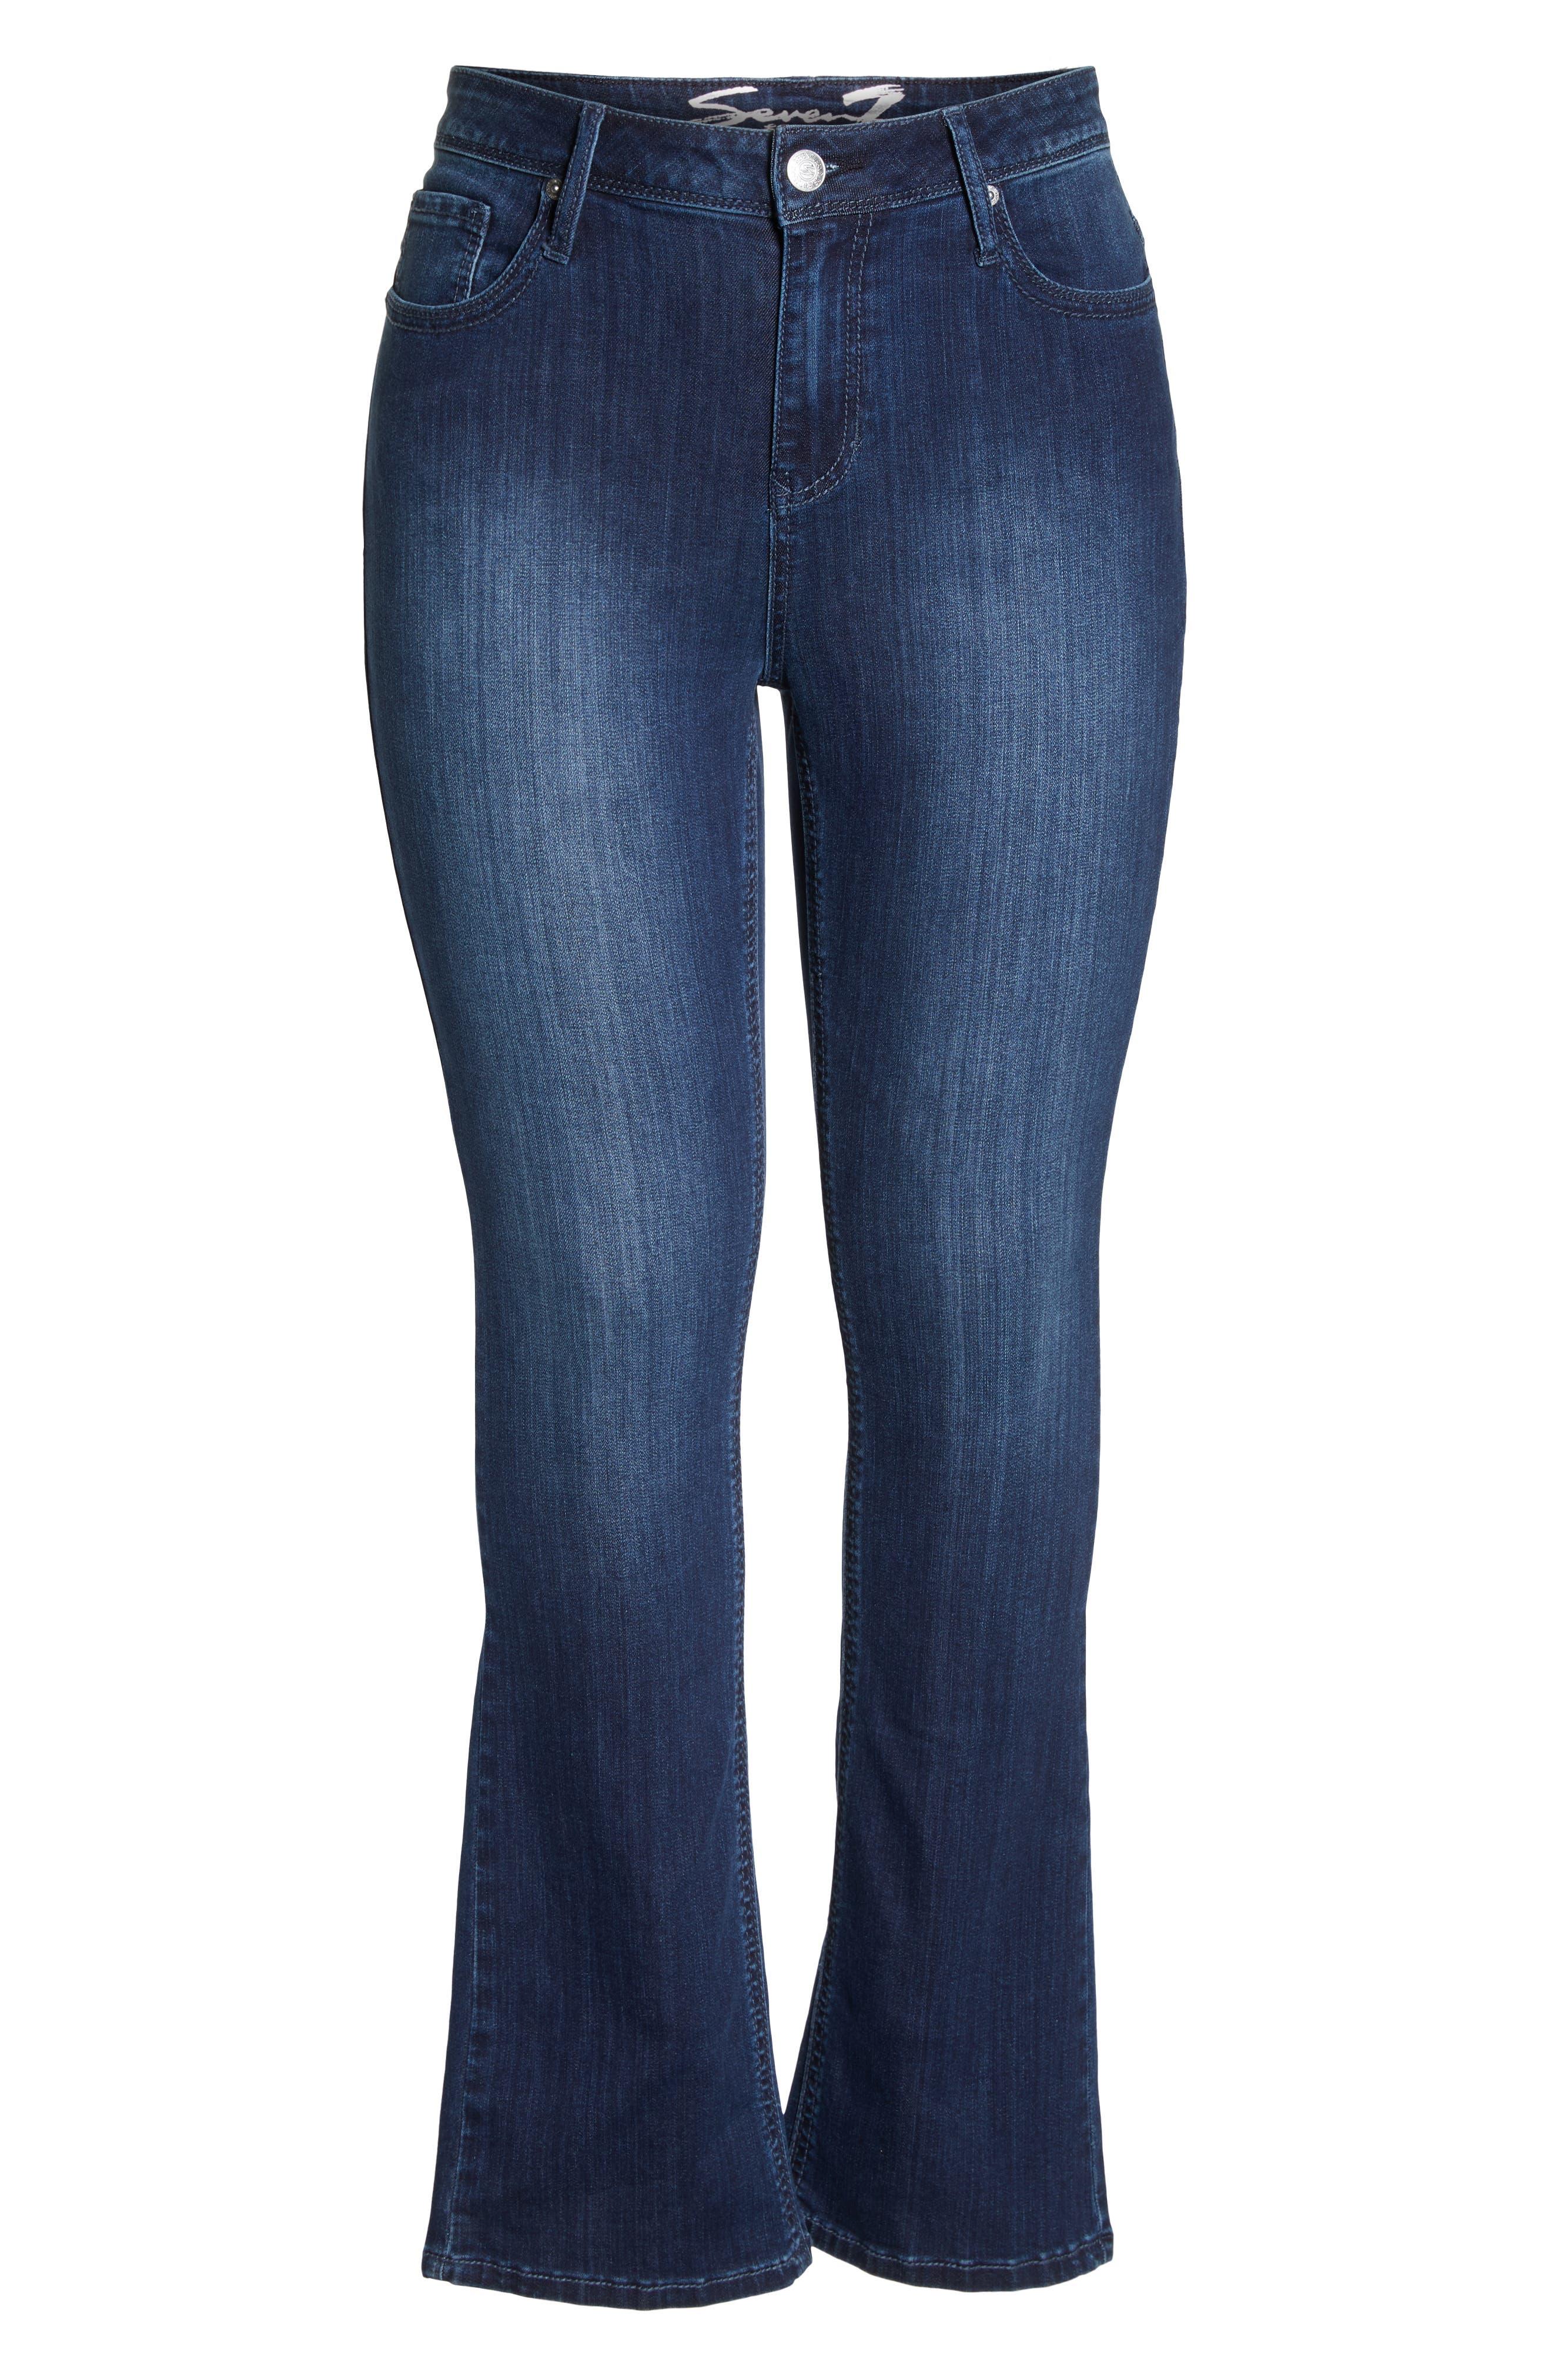 SEVEN7, Rocker Flap Pocket Slim Bootcut Jeans, Alternate thumbnail 7, color, CHALLENGER